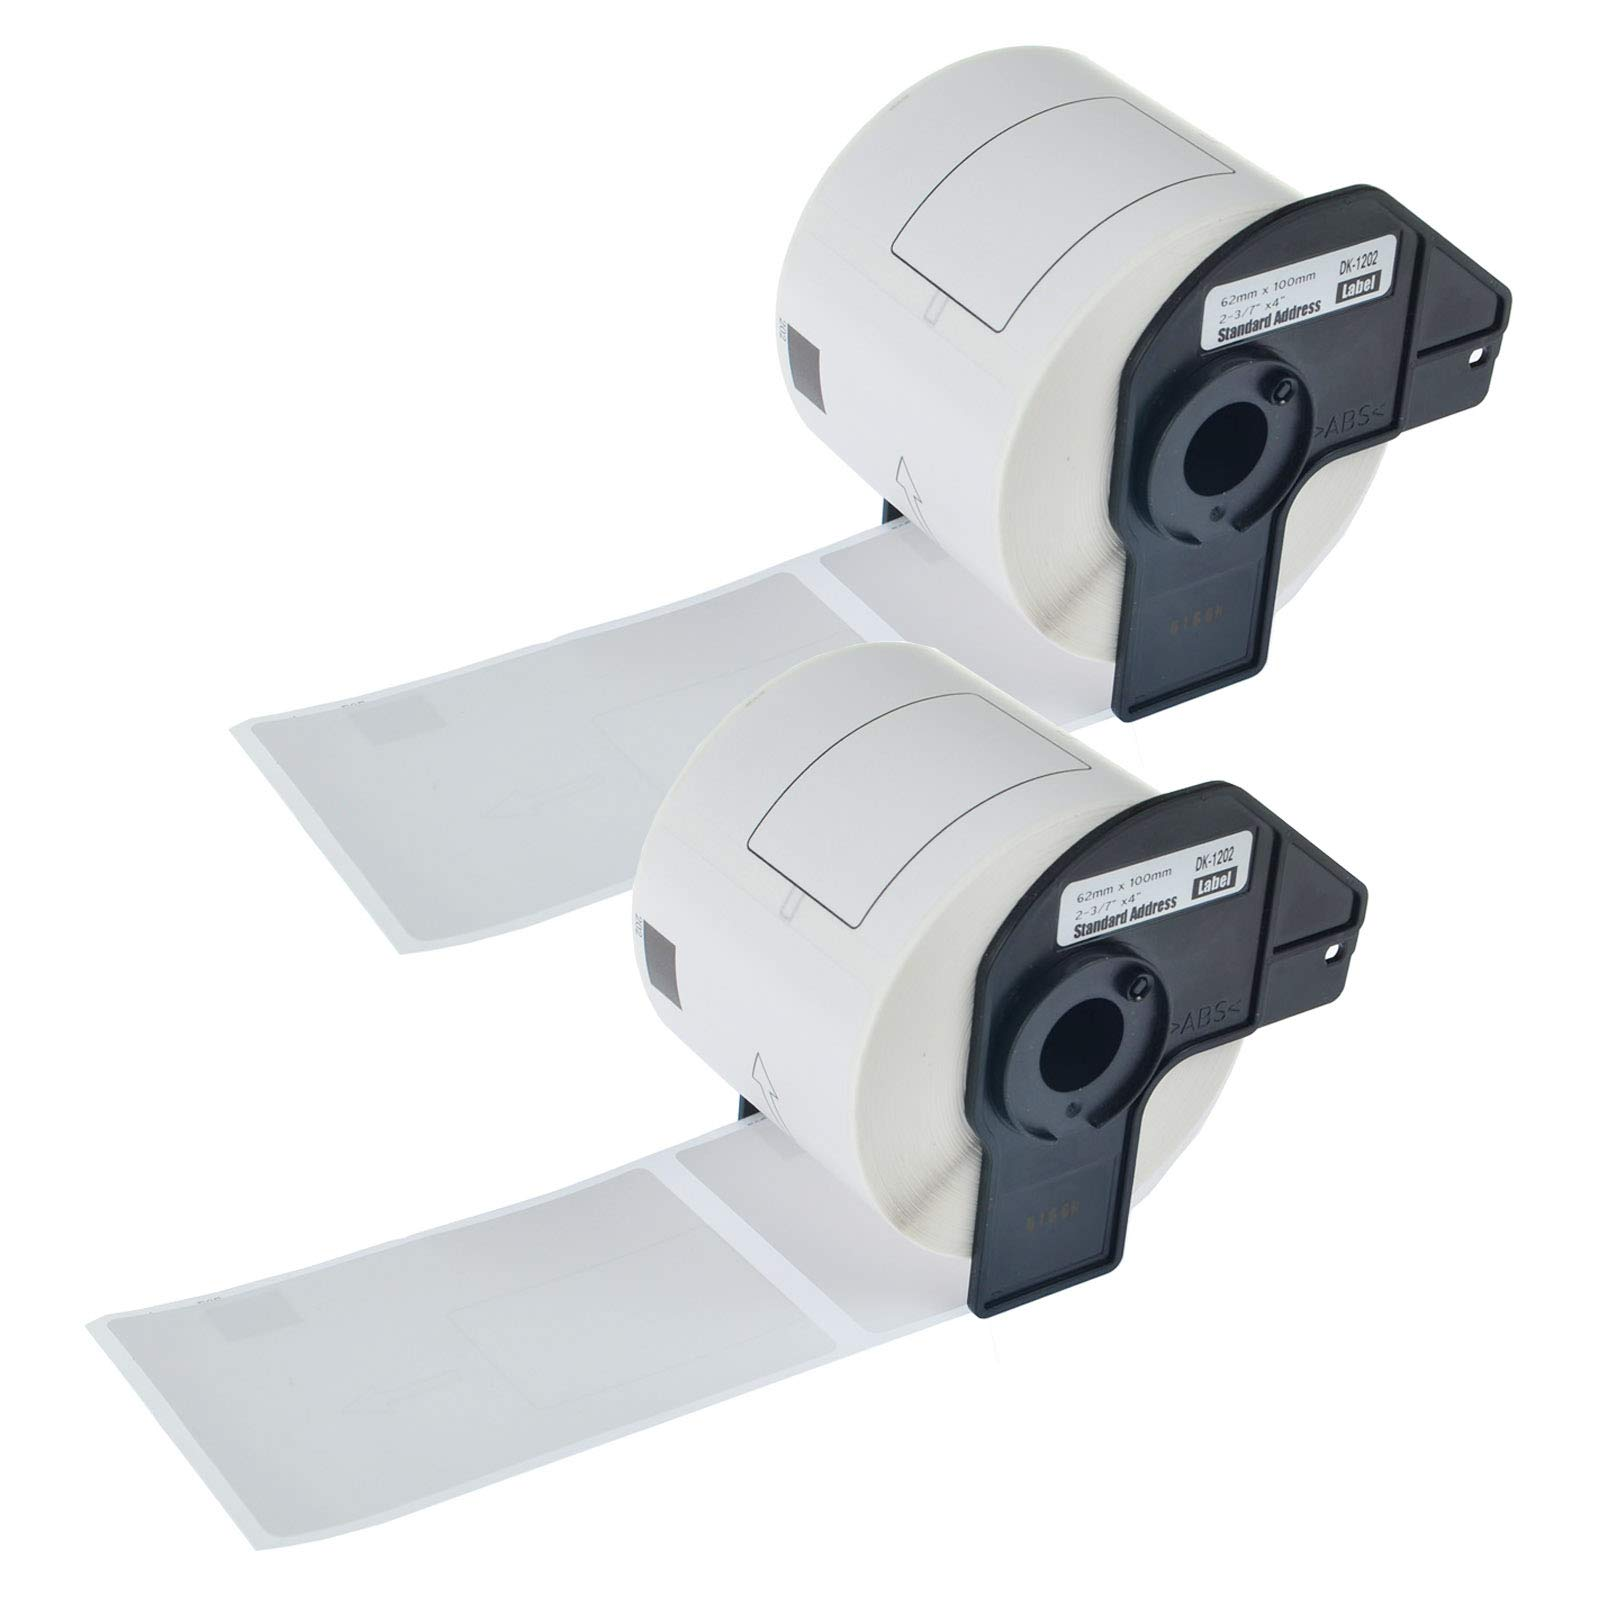 KCYMTONER 2 Rolls of Compatible Brother DK-1202 White Continuous Length Paper Tape Labels 62mm x 100mm (2-3/7'' x 4'') for QL-500 QL-570 QL-580N QL-650TD QL-710W QL-1050 QL-1060N Series